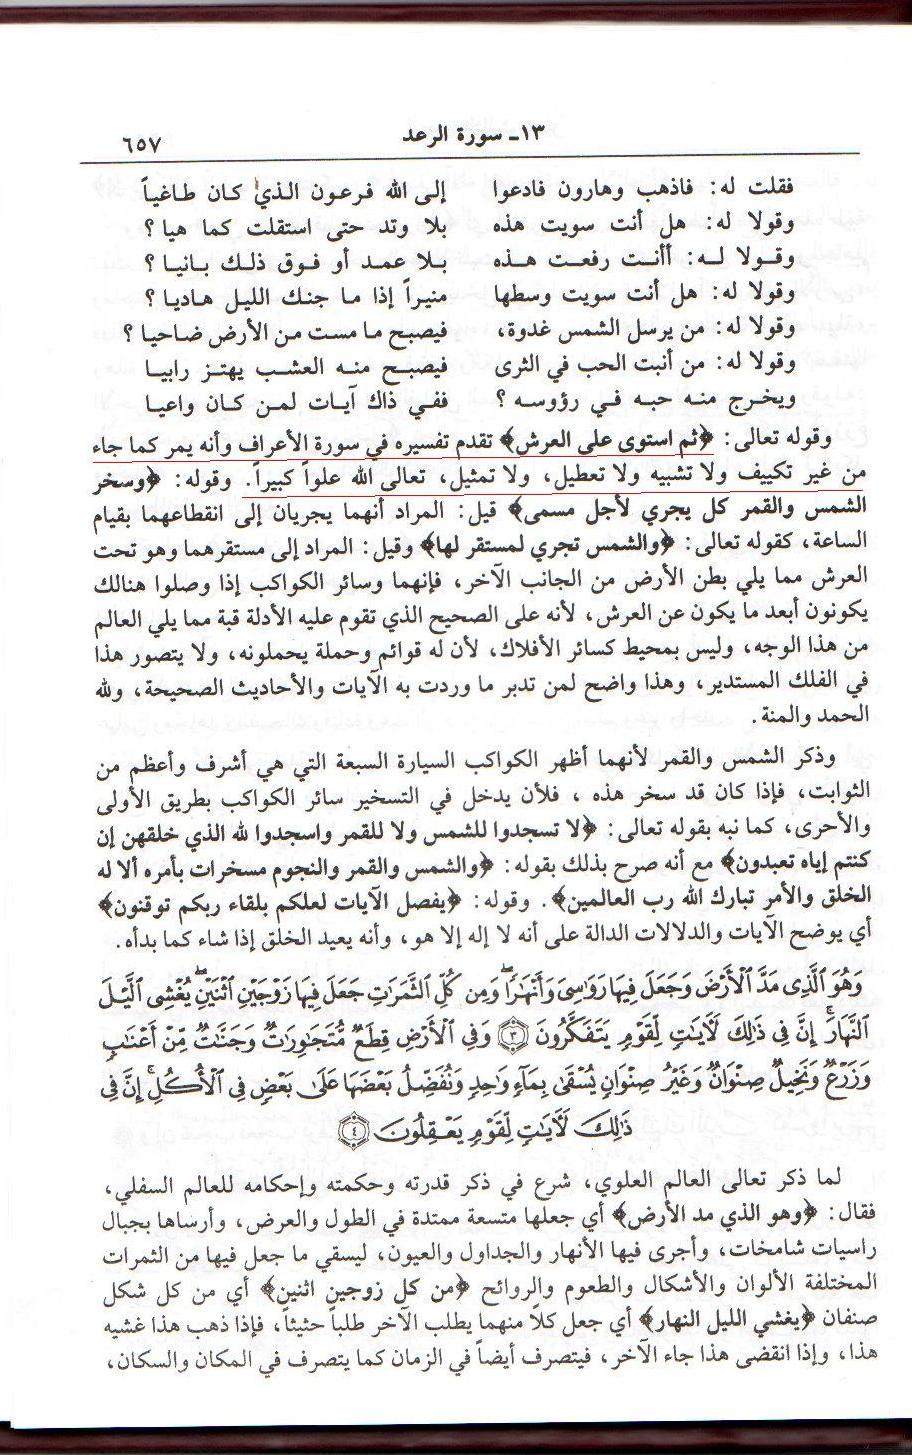 yang dikenal dalam bahasa arab dan dalam kitab-kitab Ulama salaf